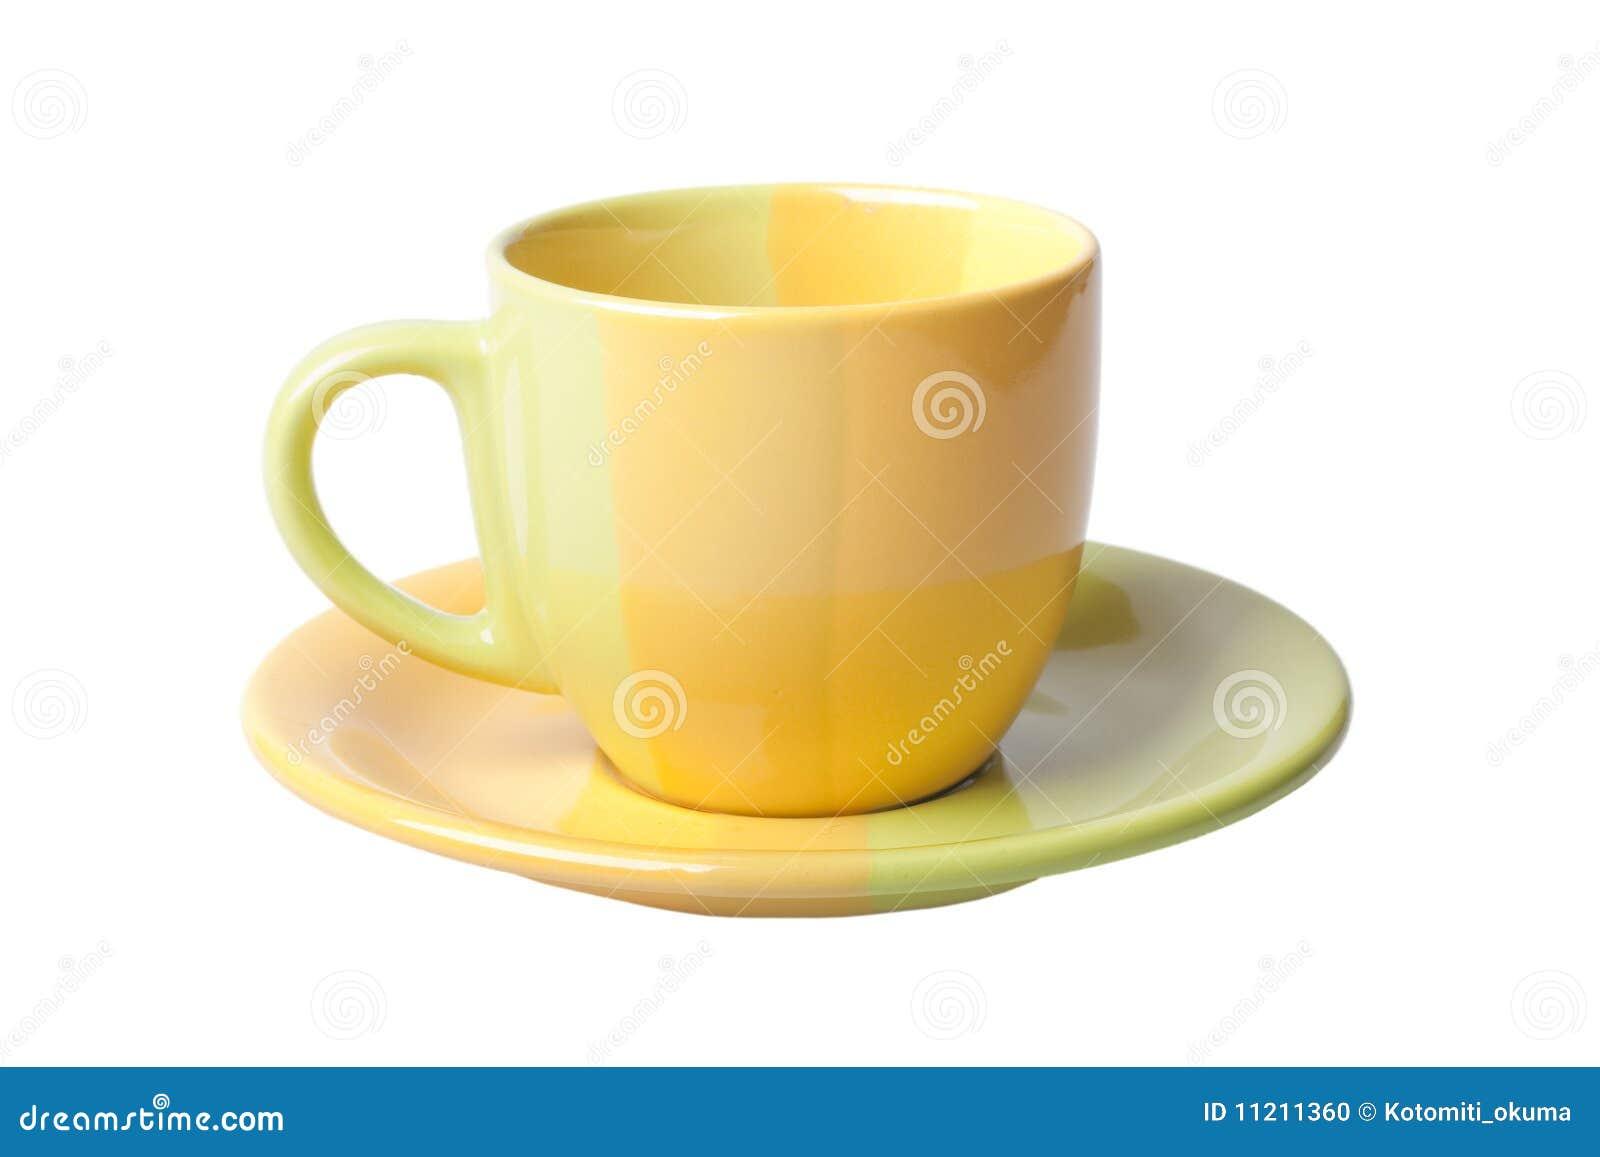 Stock Vector Alliesinteract 11211360: Colour Tea Cup Stock Photo. Image Of Beautiful, Ceramic